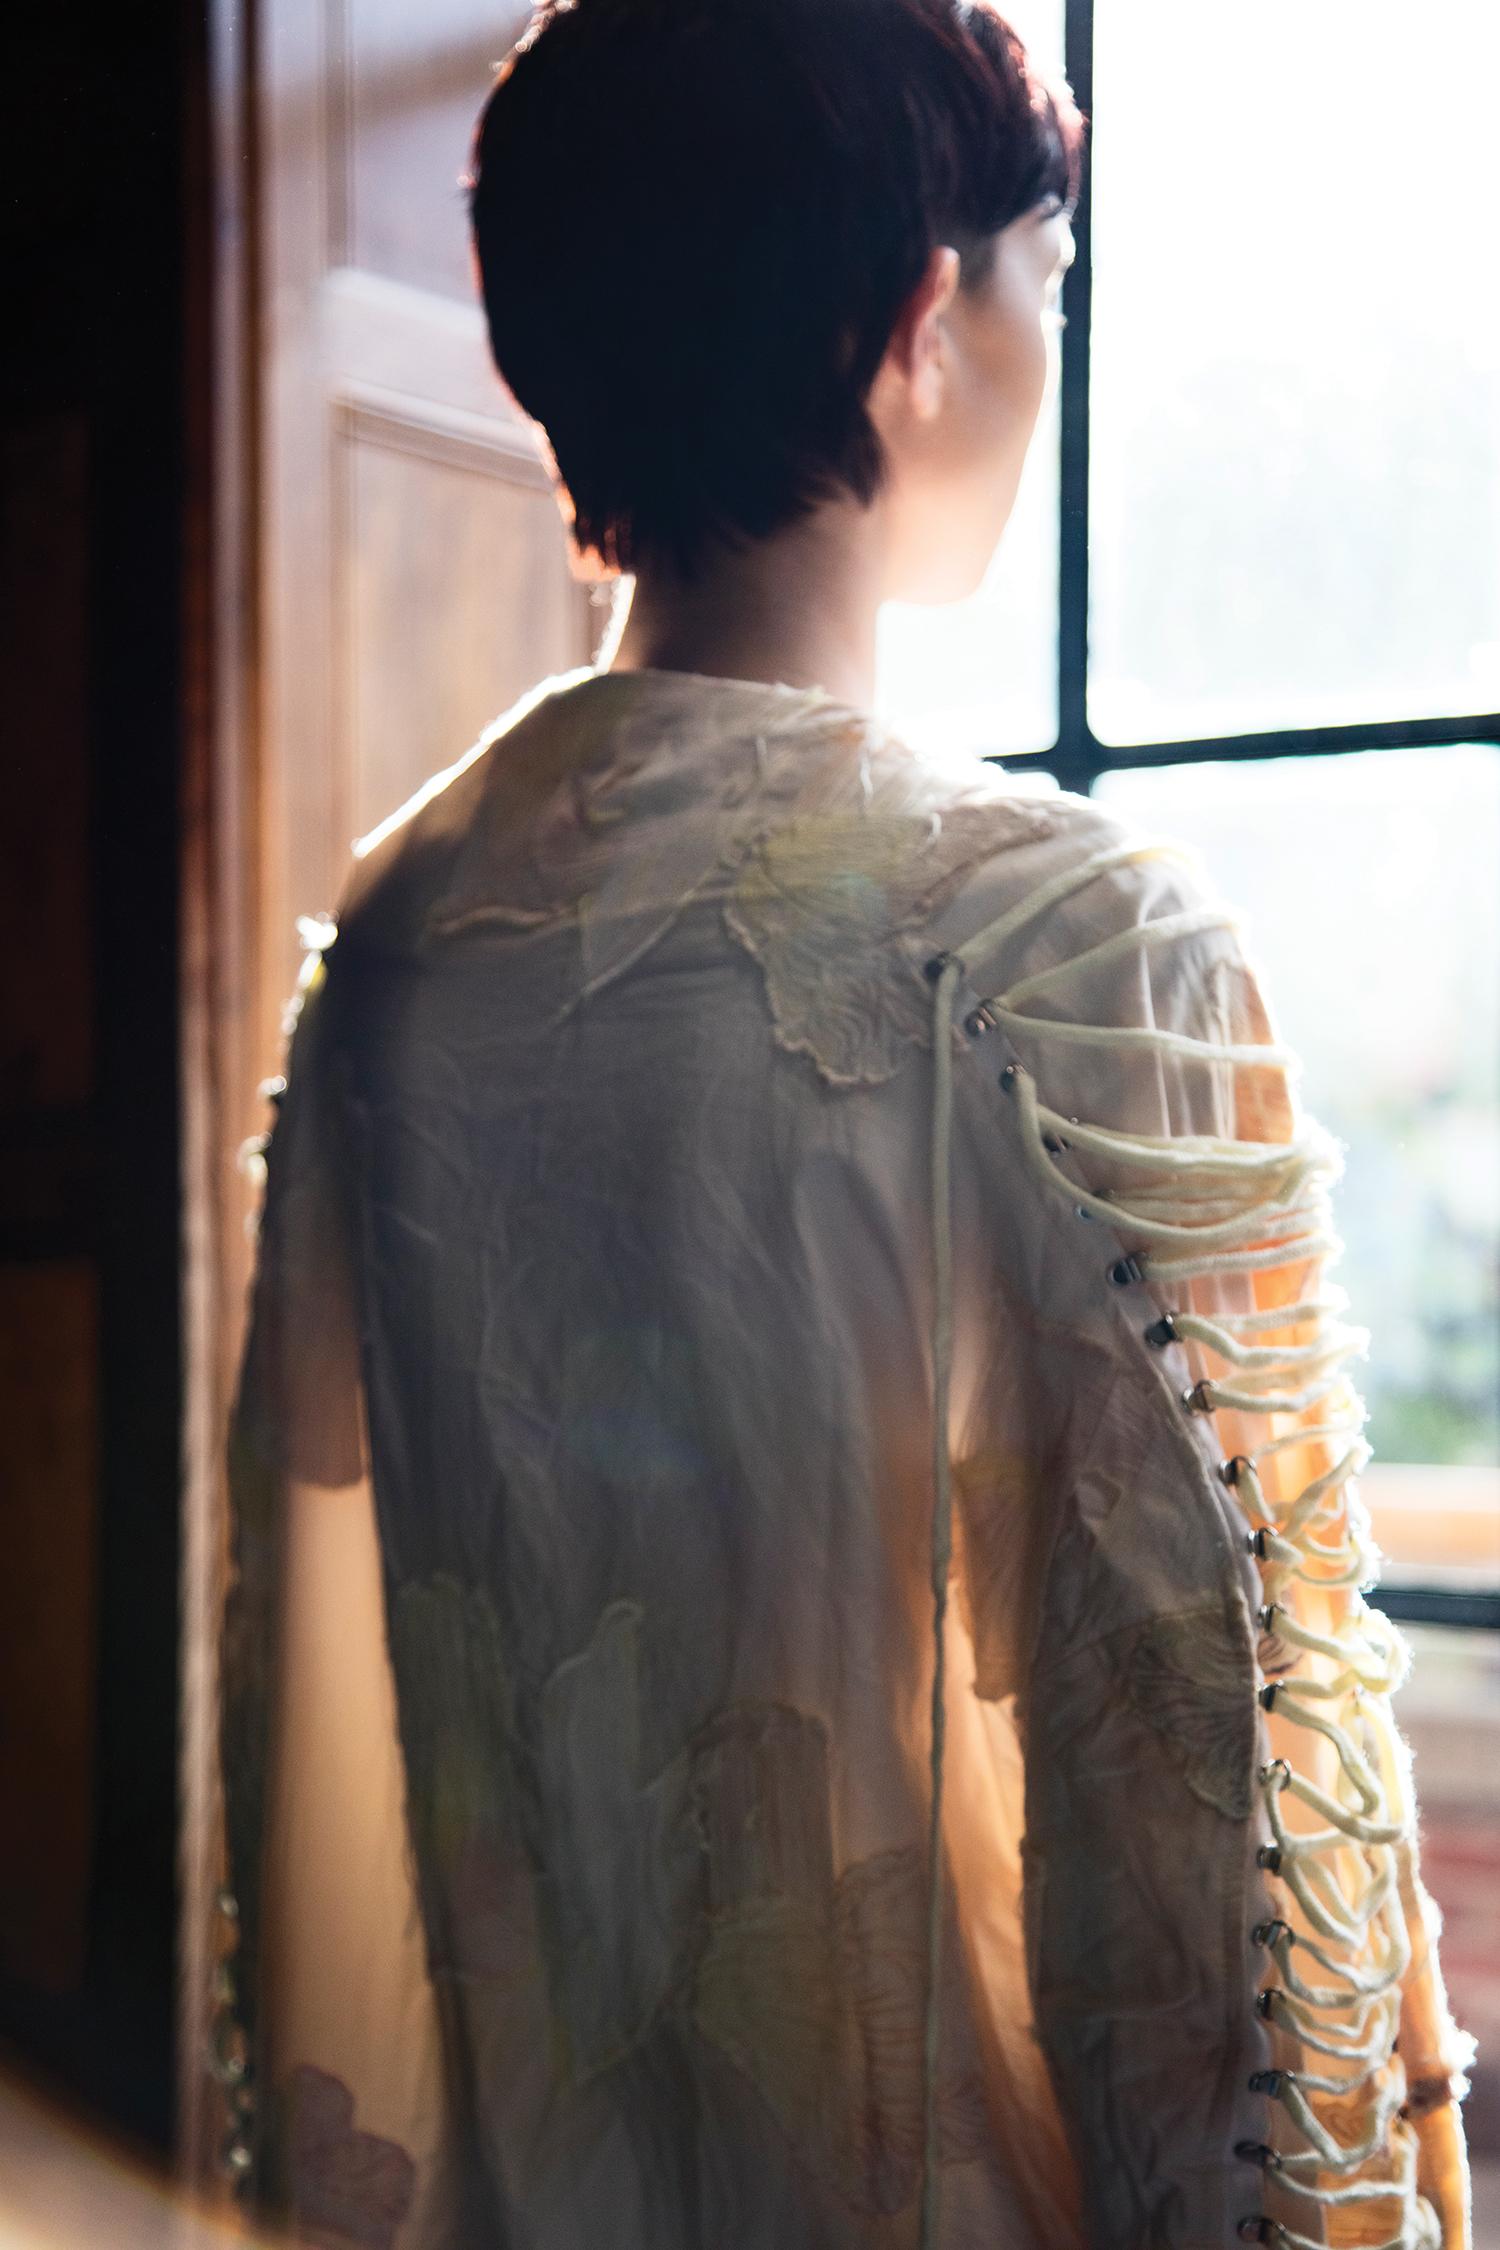 Jumpsuit by Brandon Kee, BFA Menswear Design.